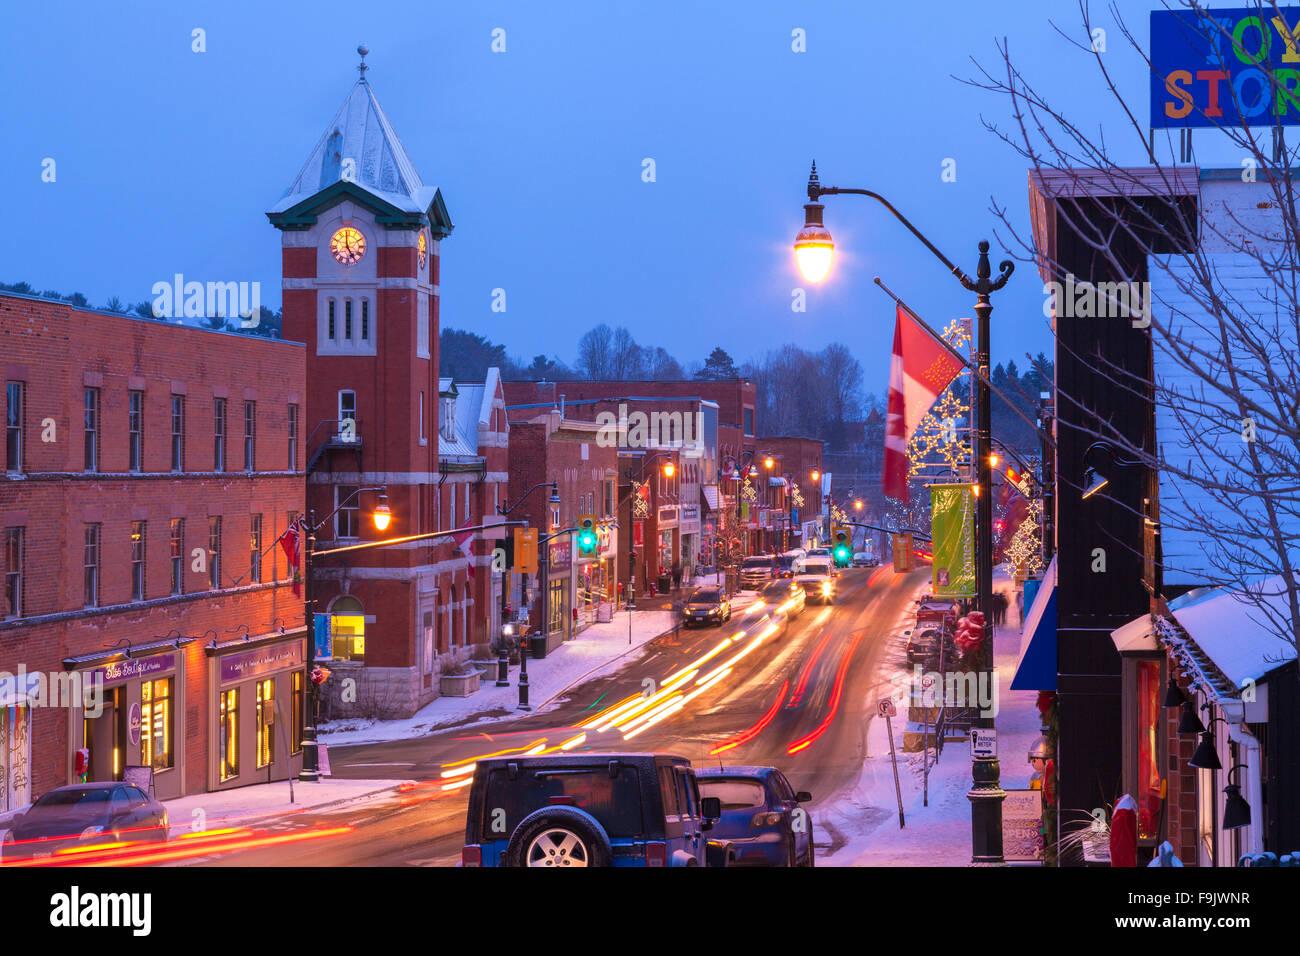 Bracebridge Lions Club, Ontario, Canada, District A-12 ...